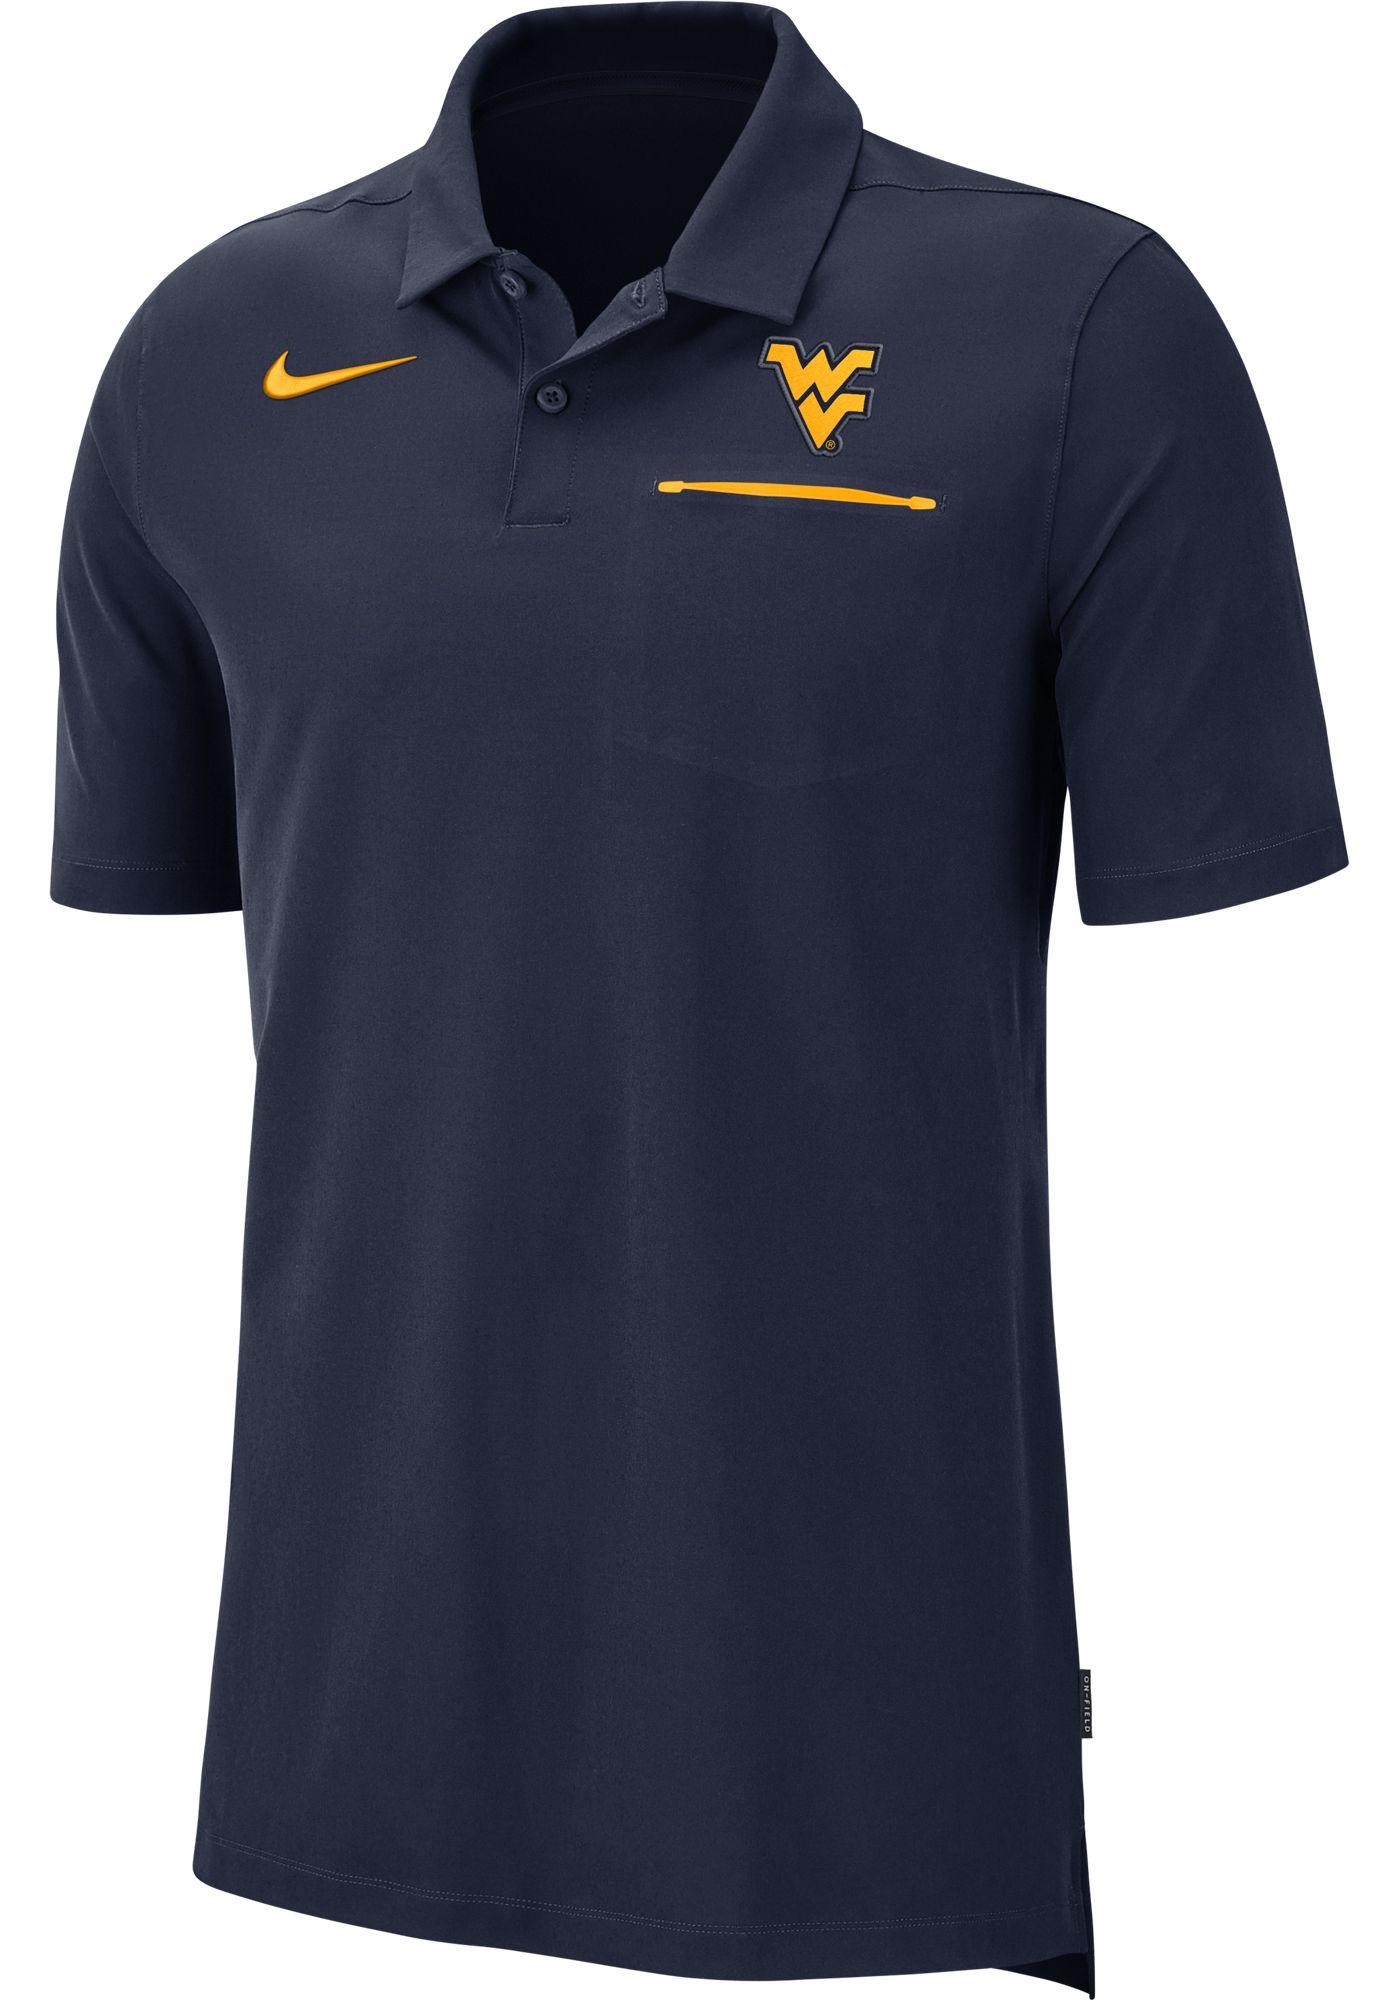 Nike Men's West Virginia Mountaineers Blue Dri-FIT Elite Football Sideline Polo